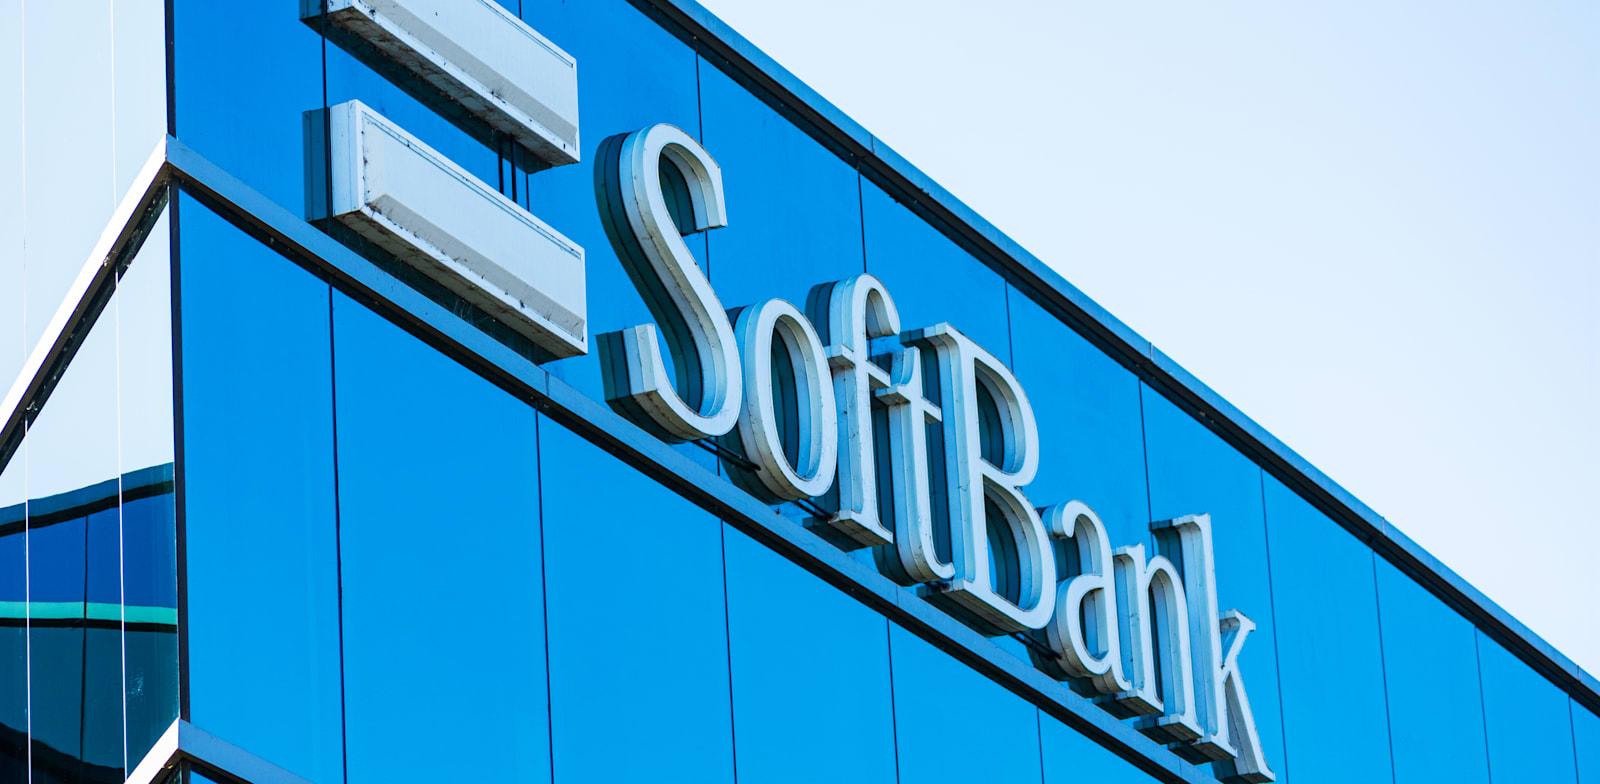 Softbank Photo: Shutterstock